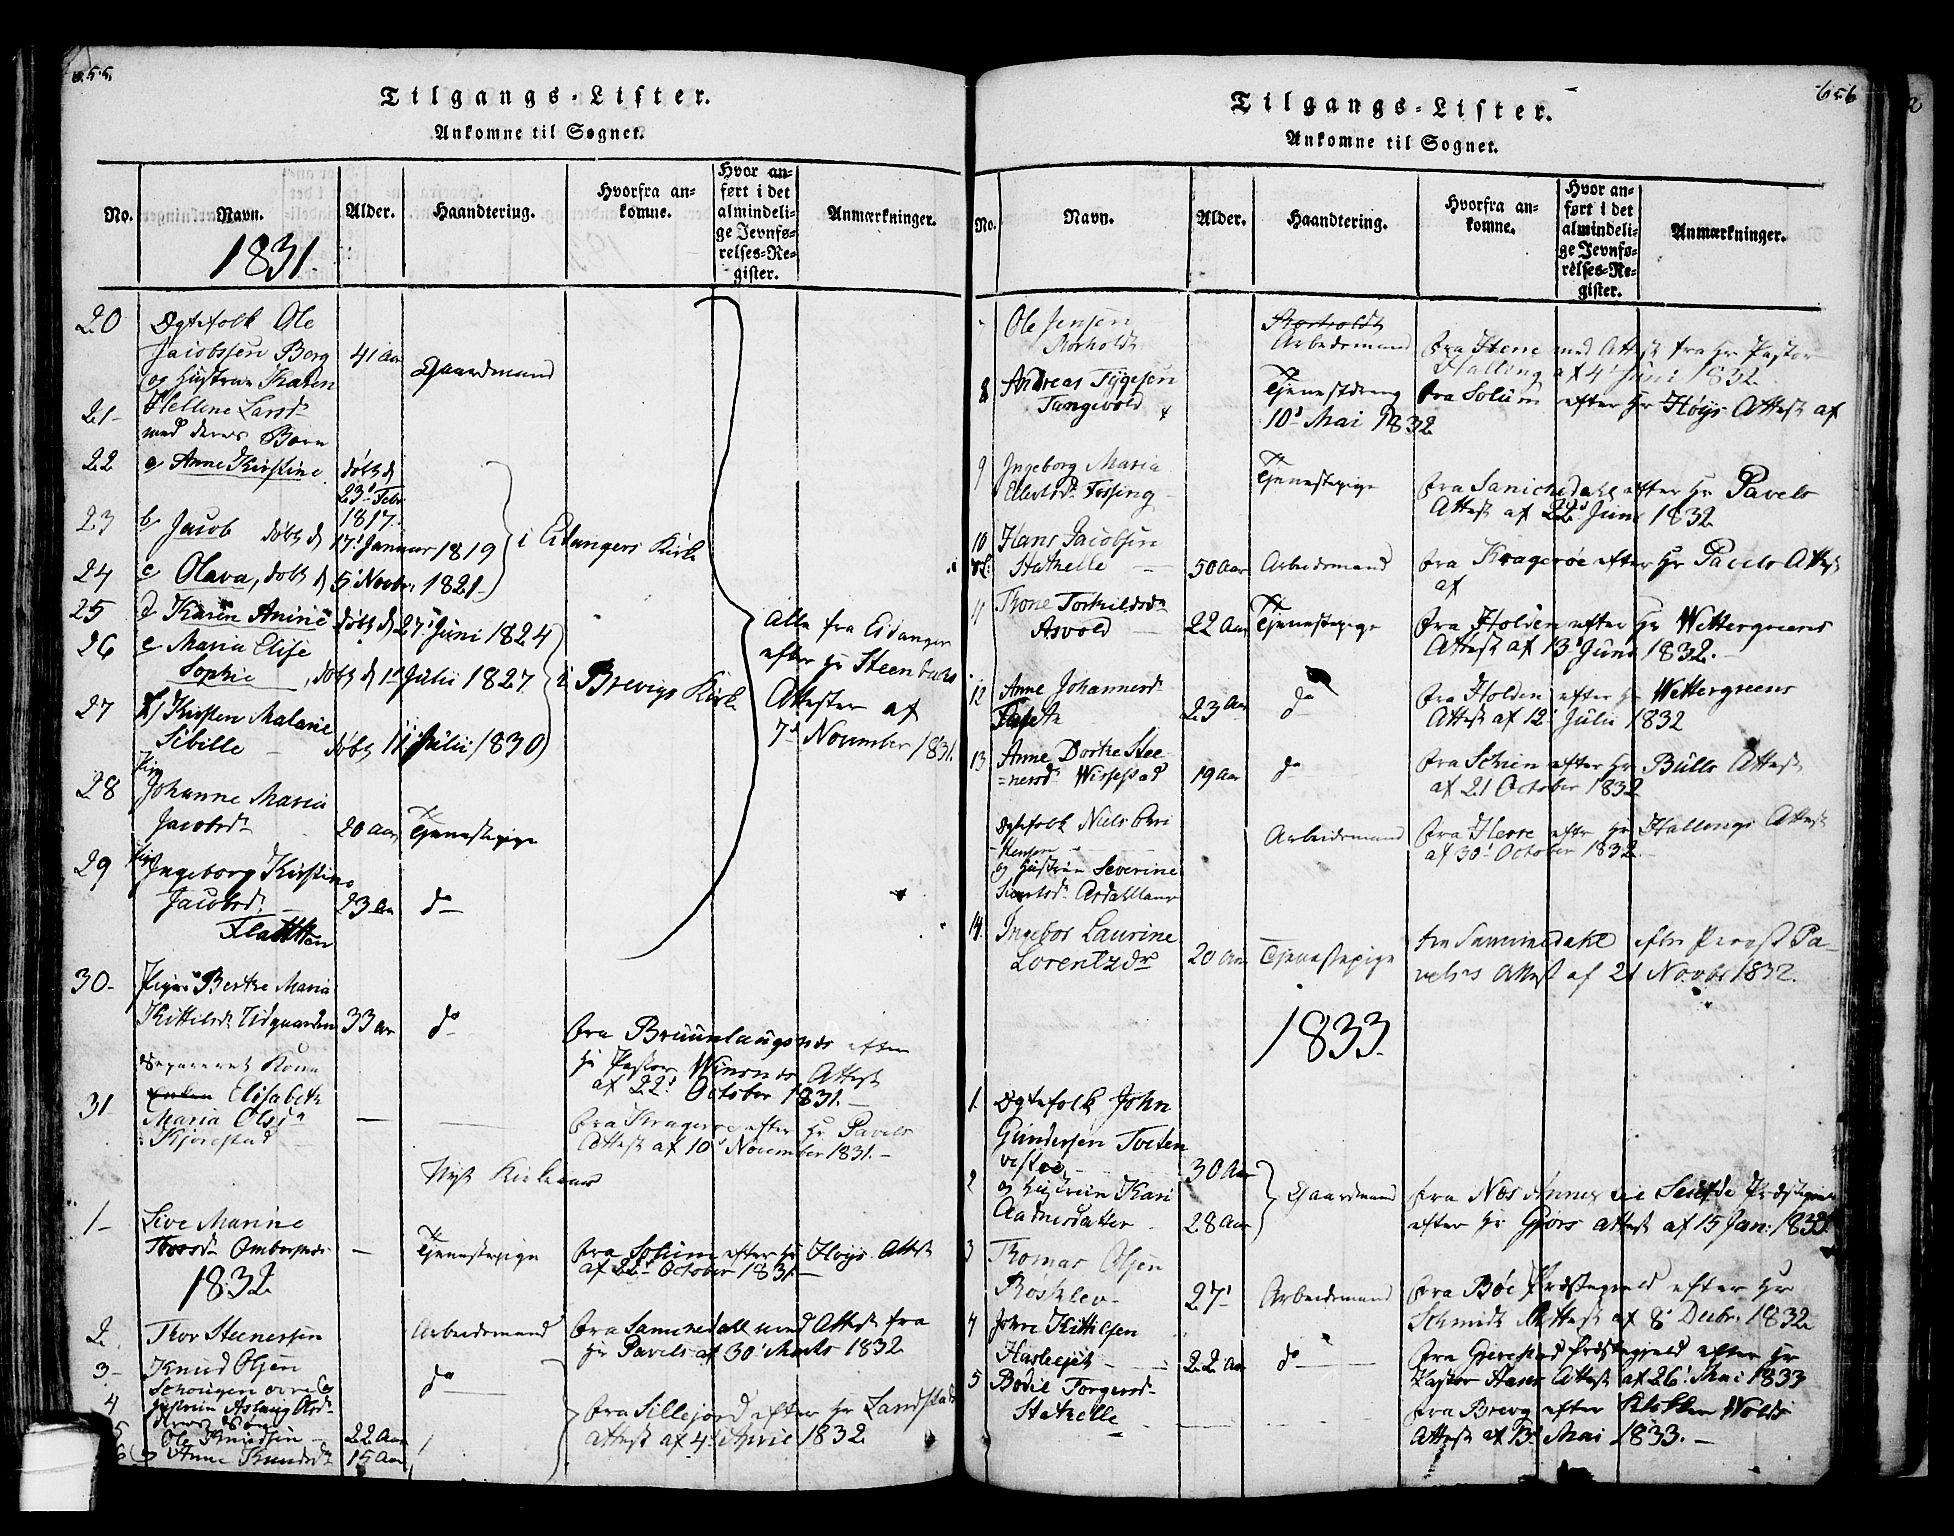 SAKO, Bamble kirkebøker, F/Fa/L0003: Ministerialbok nr. I 3 /1, 1814-1834, s. 655-656